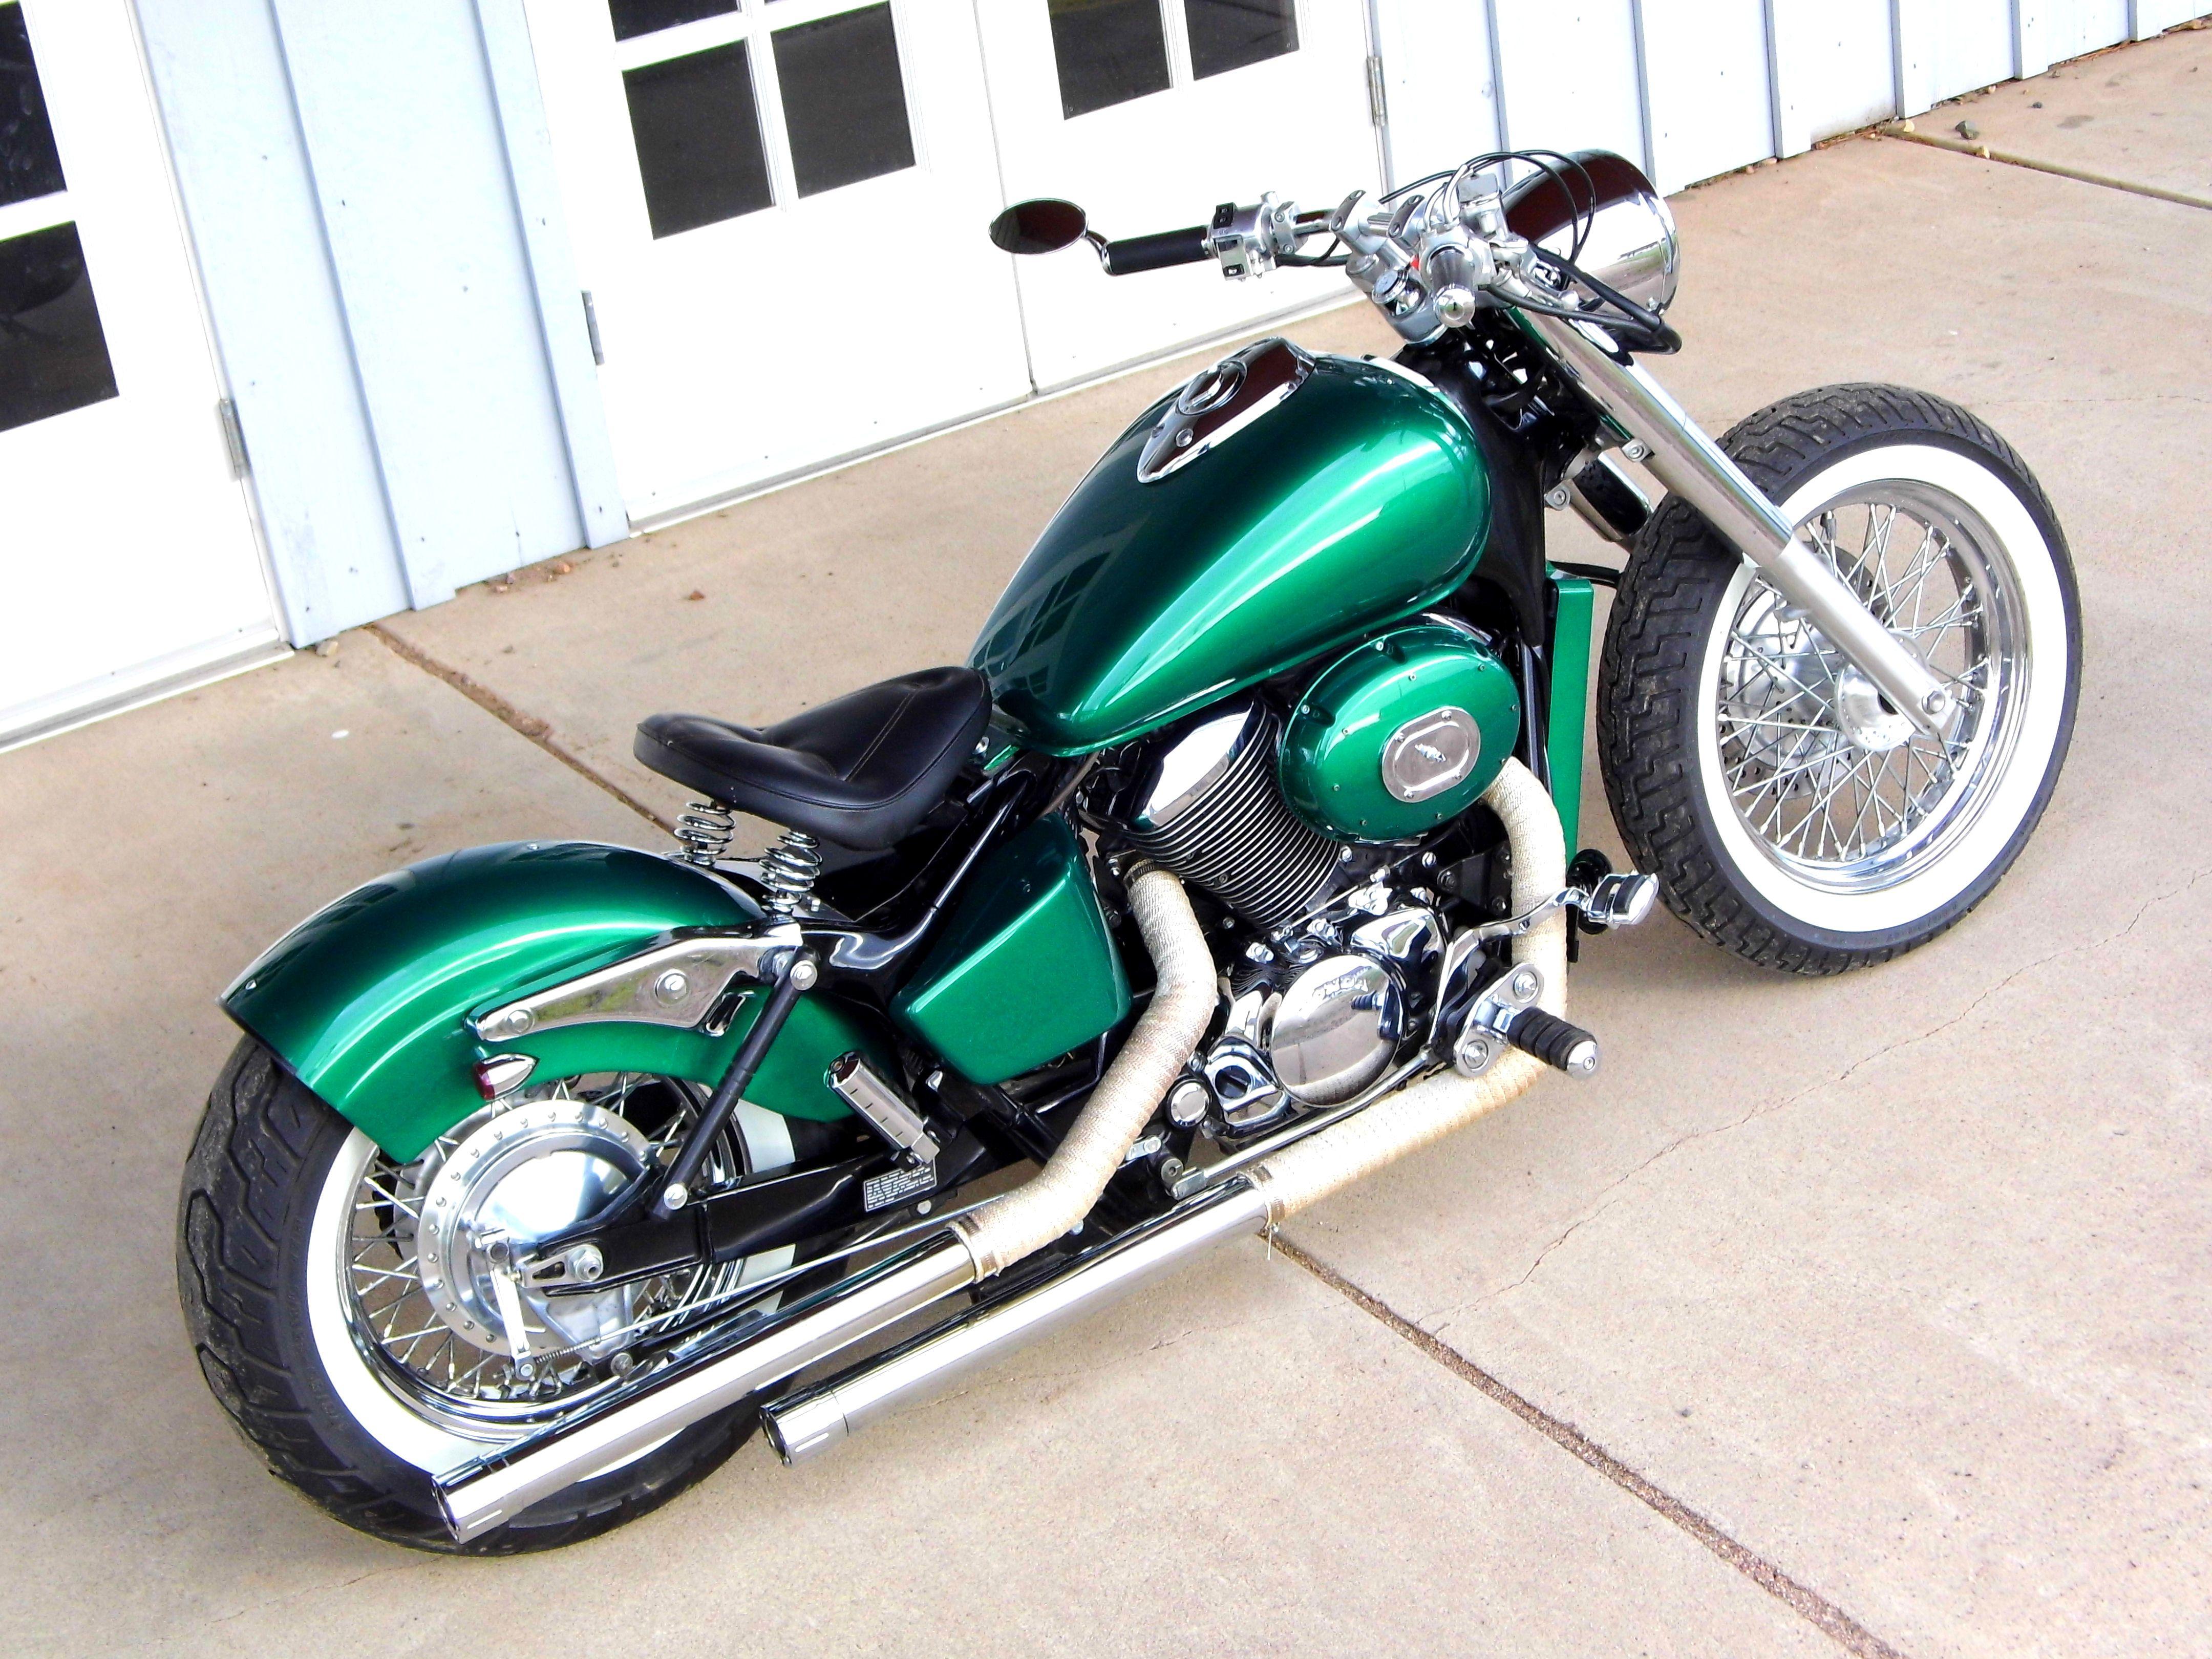 Honda Shadow Ace Bobber Projects Bobber Motorcycle Honda Shadow